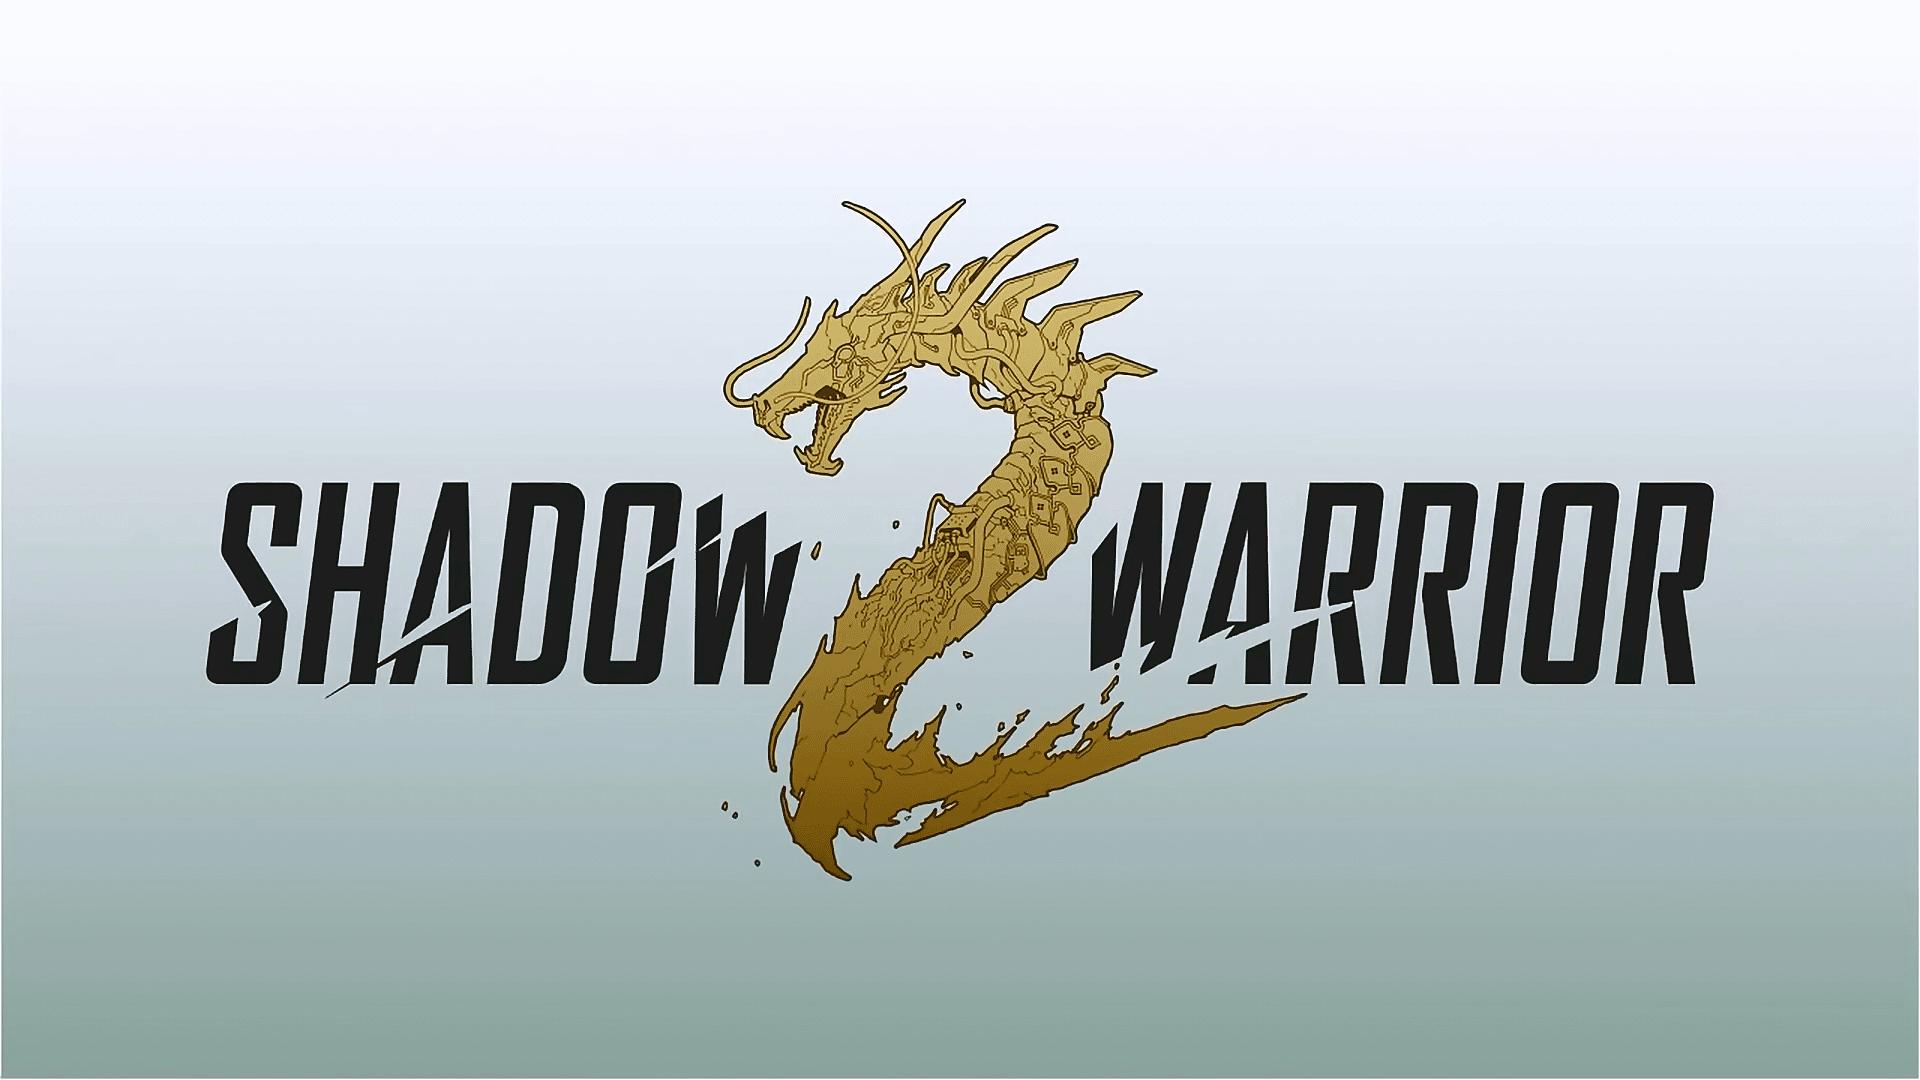 Shadow Warrior 2 telecharger gratuit de PC et Torrent